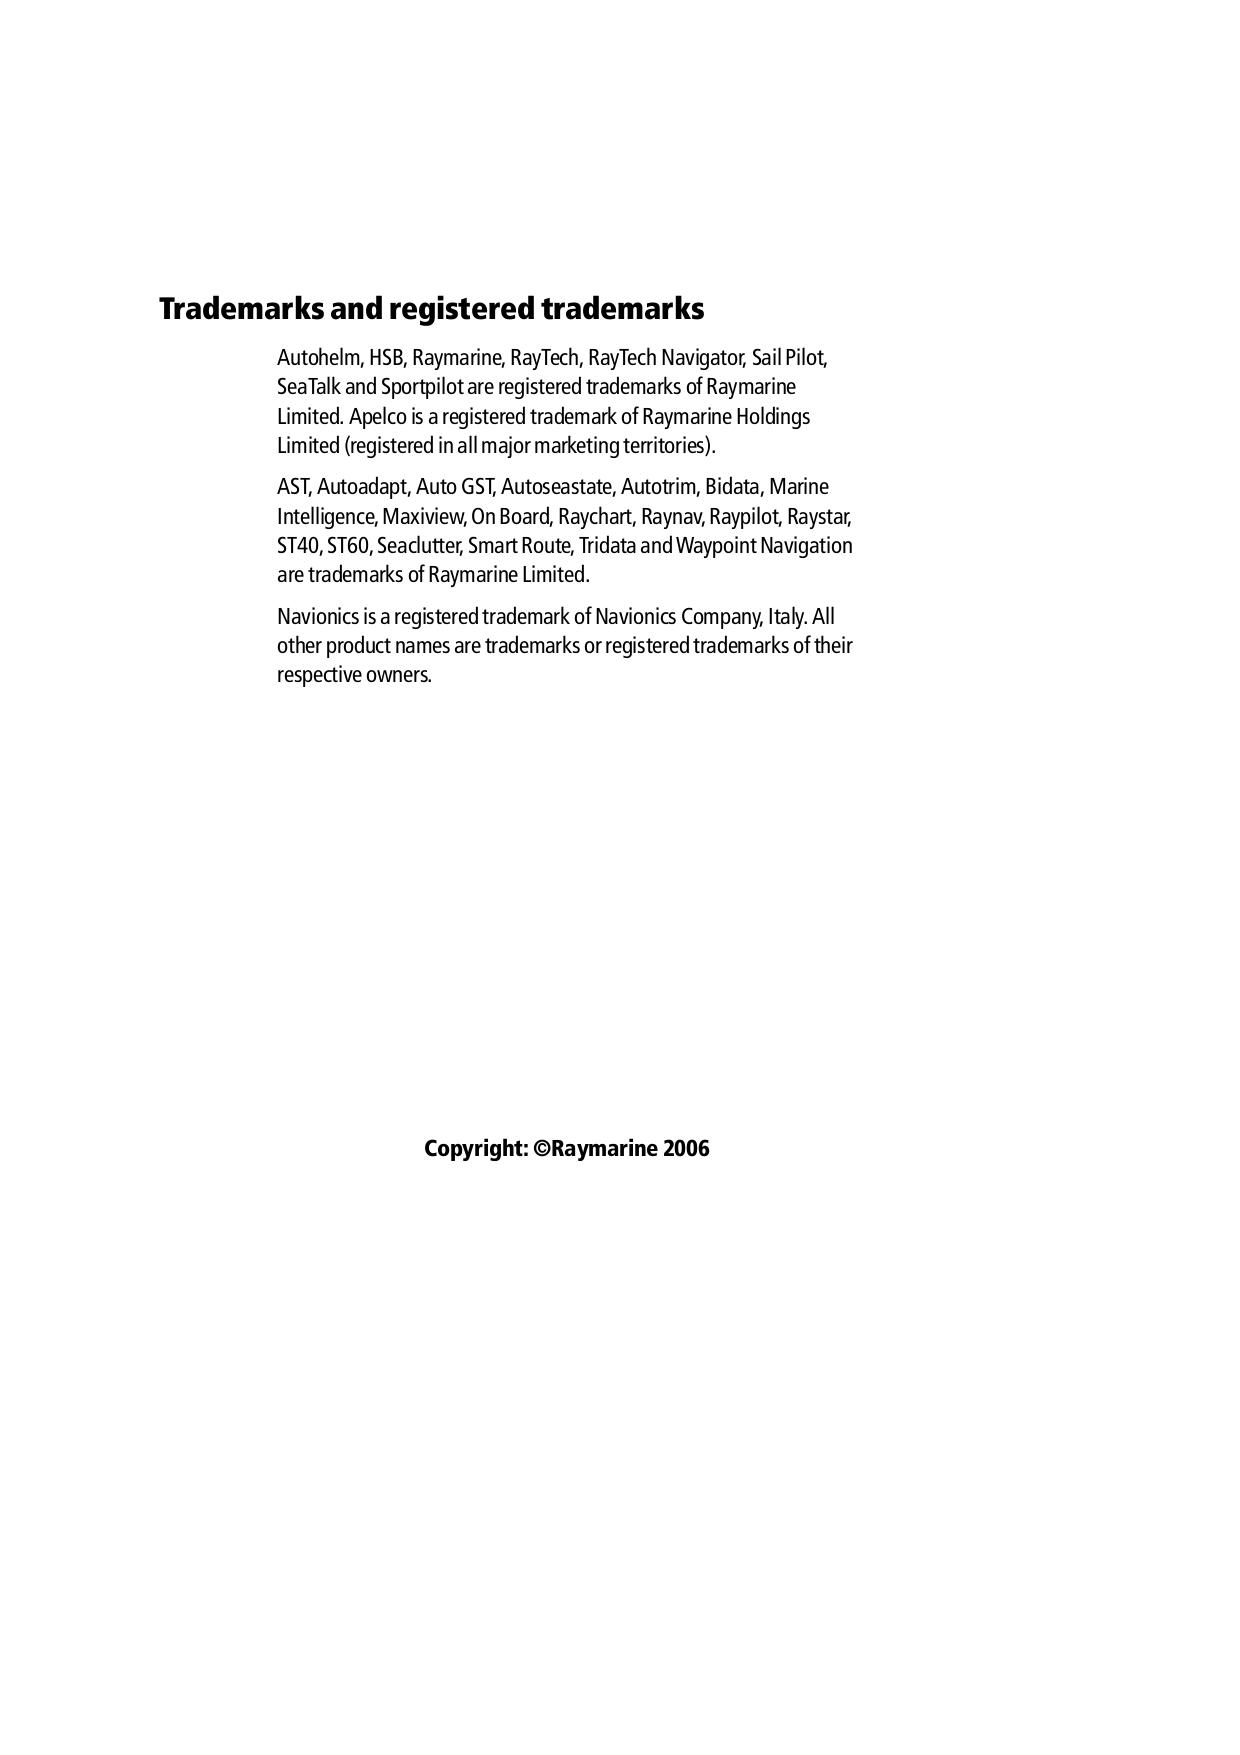 raymarine g series manual pdf